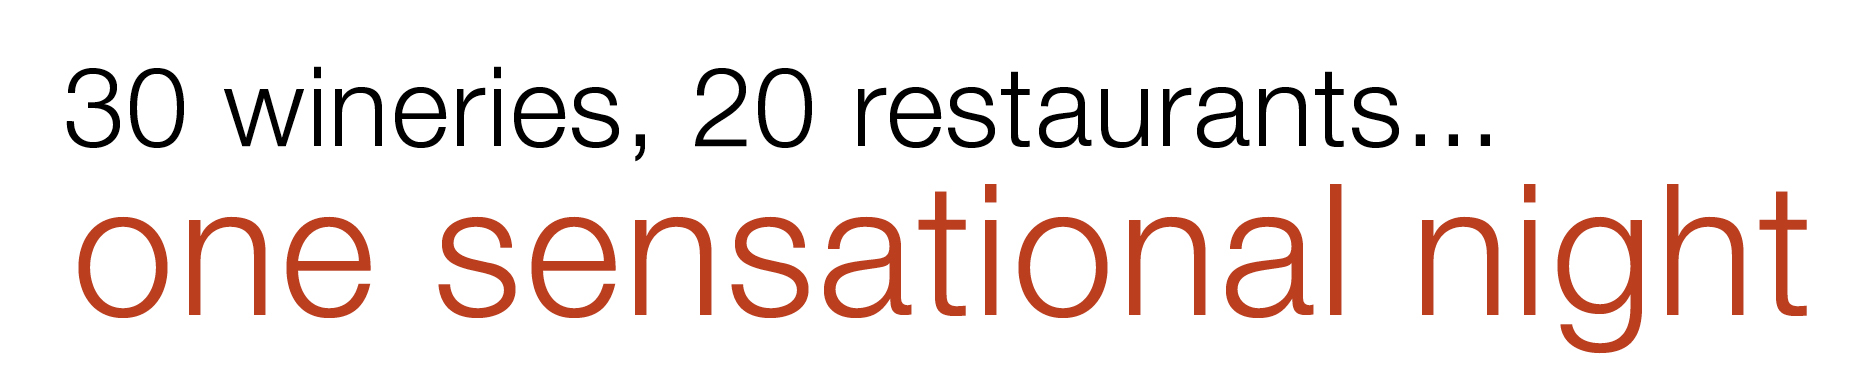 30 wineries, 20 restaurants...one sensational night!